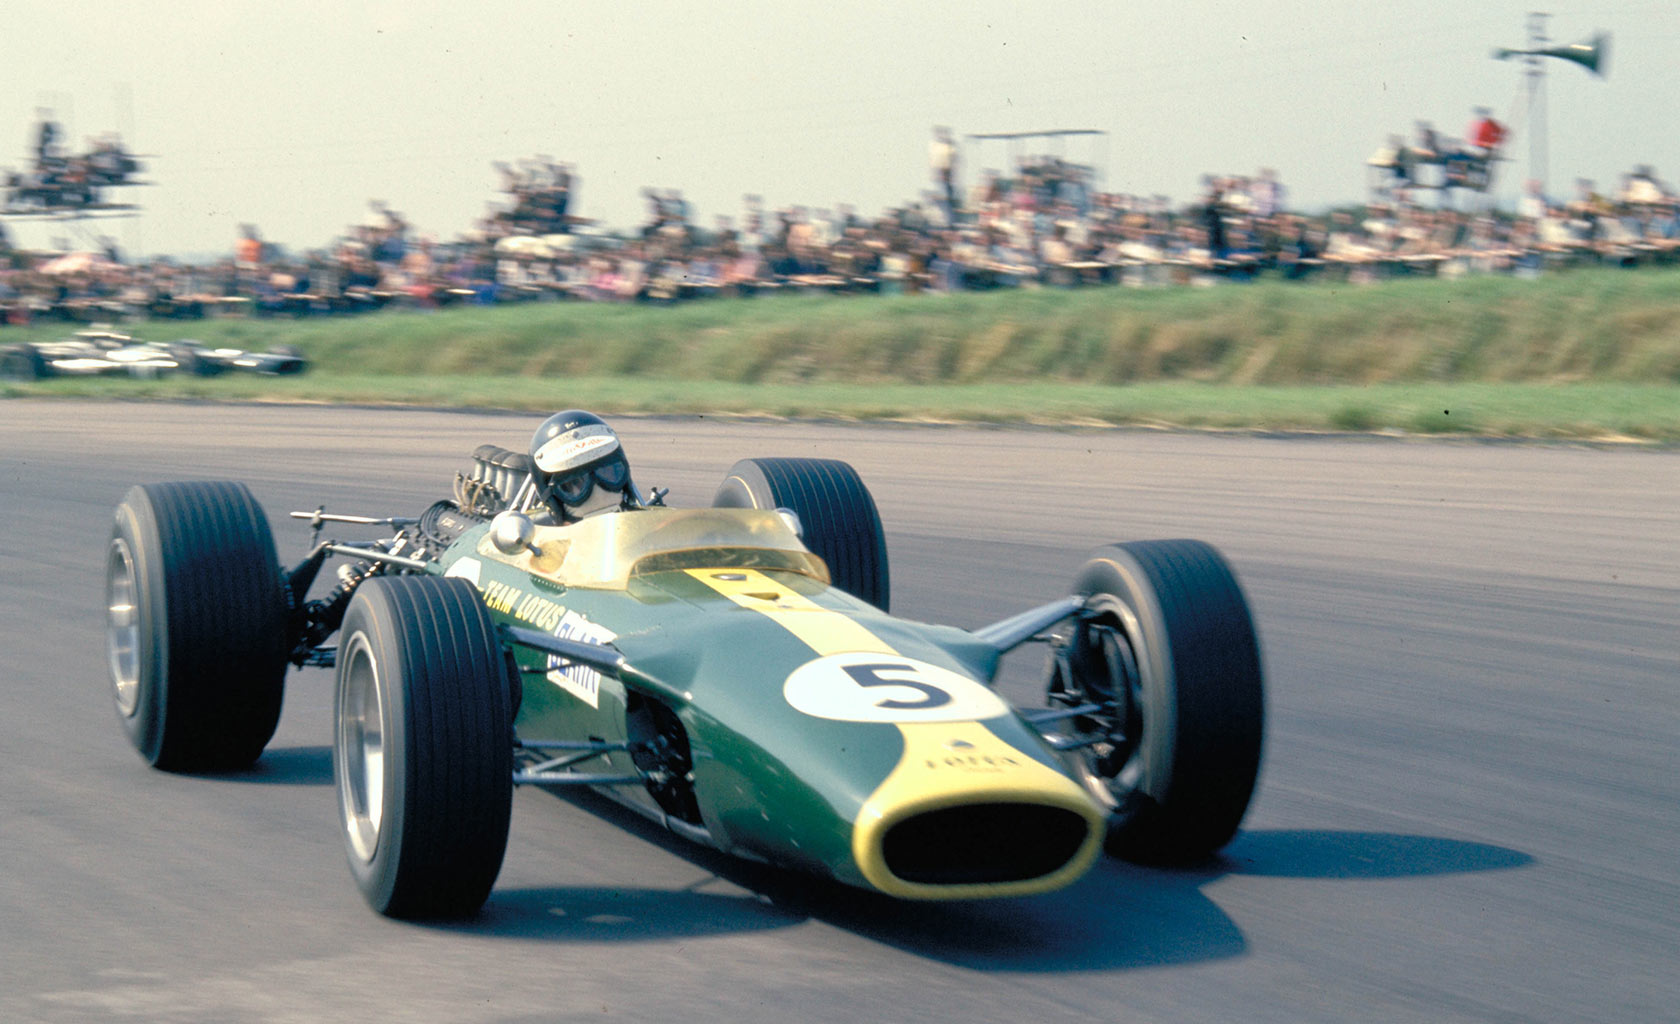 The new Lotus runs at Silverstone | joeblogsf1